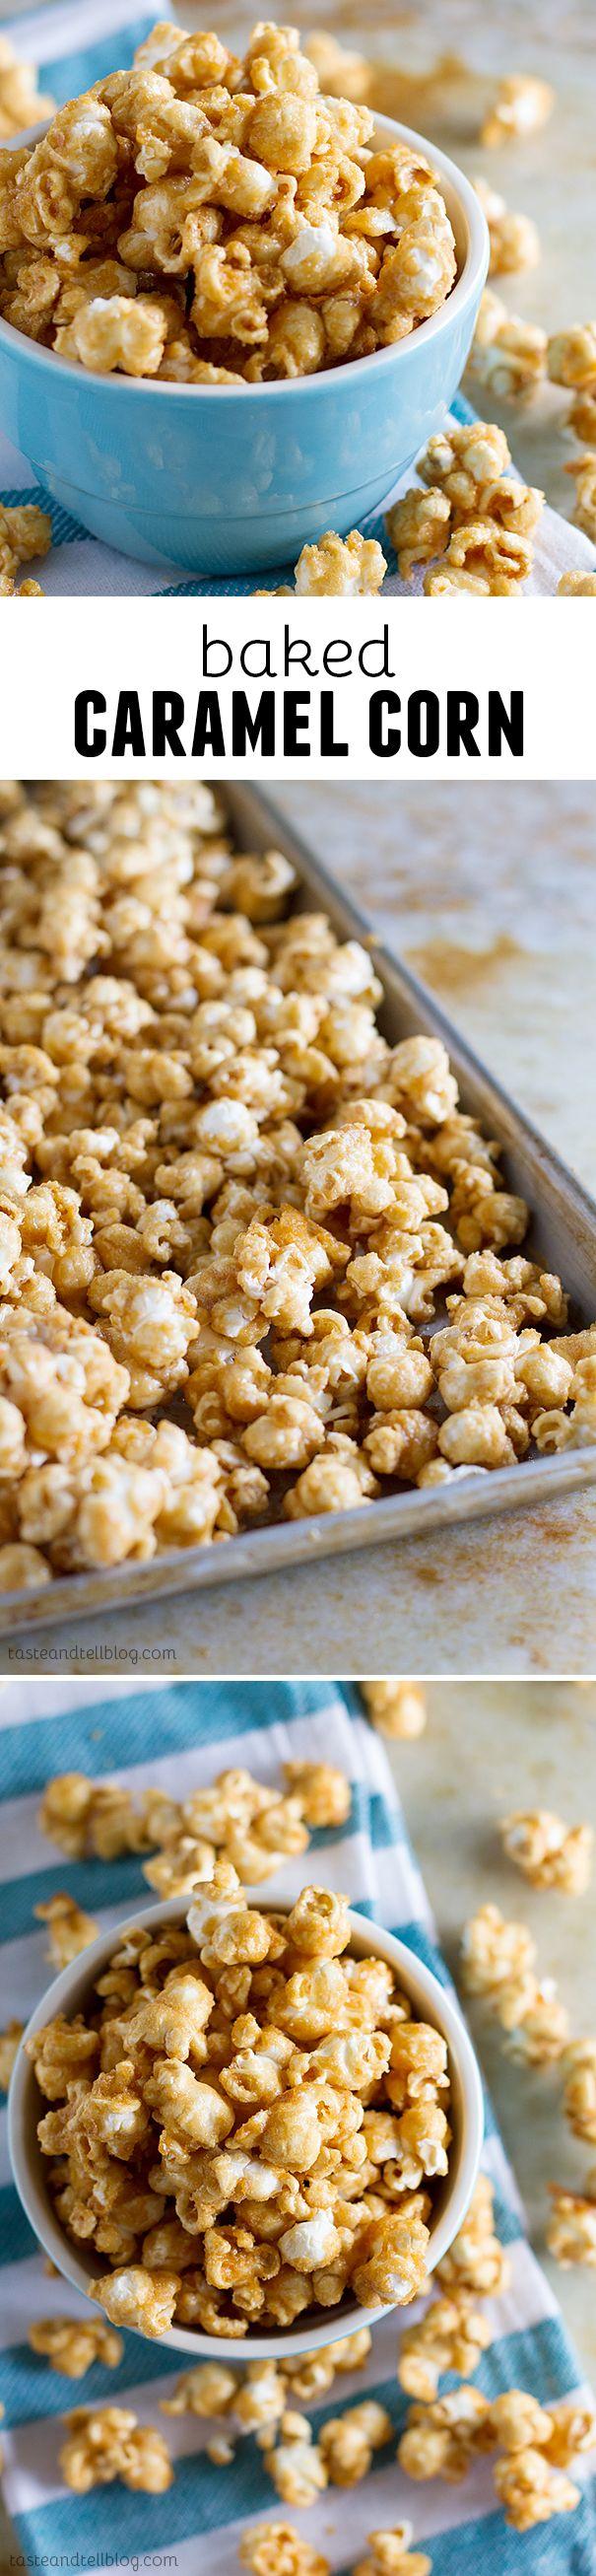 Baked Caramel Corn